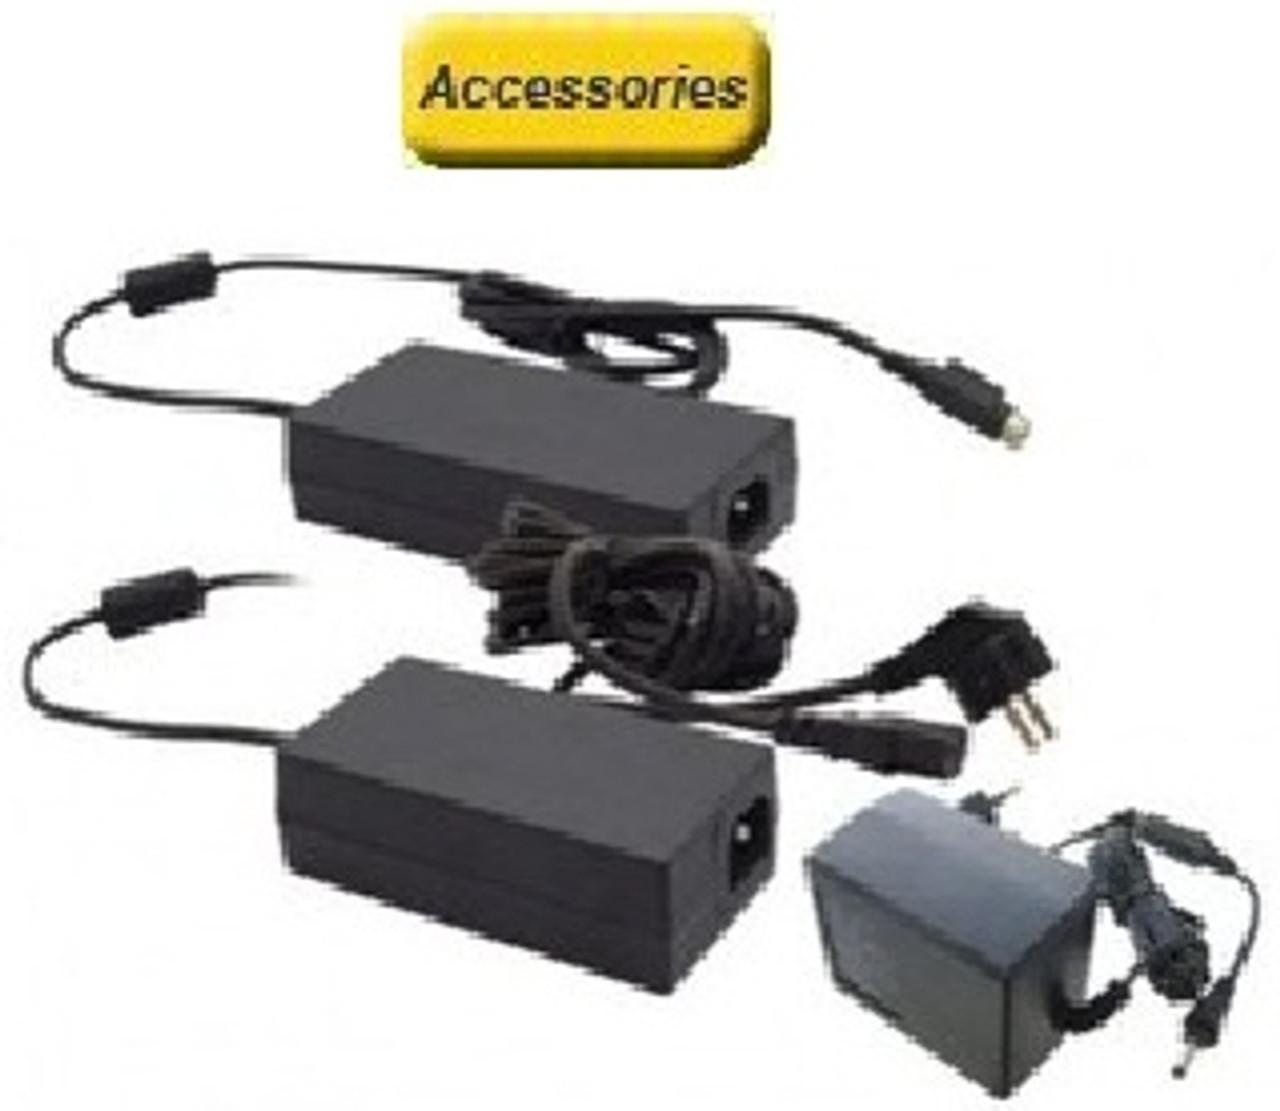 TTP 2130 Accessories